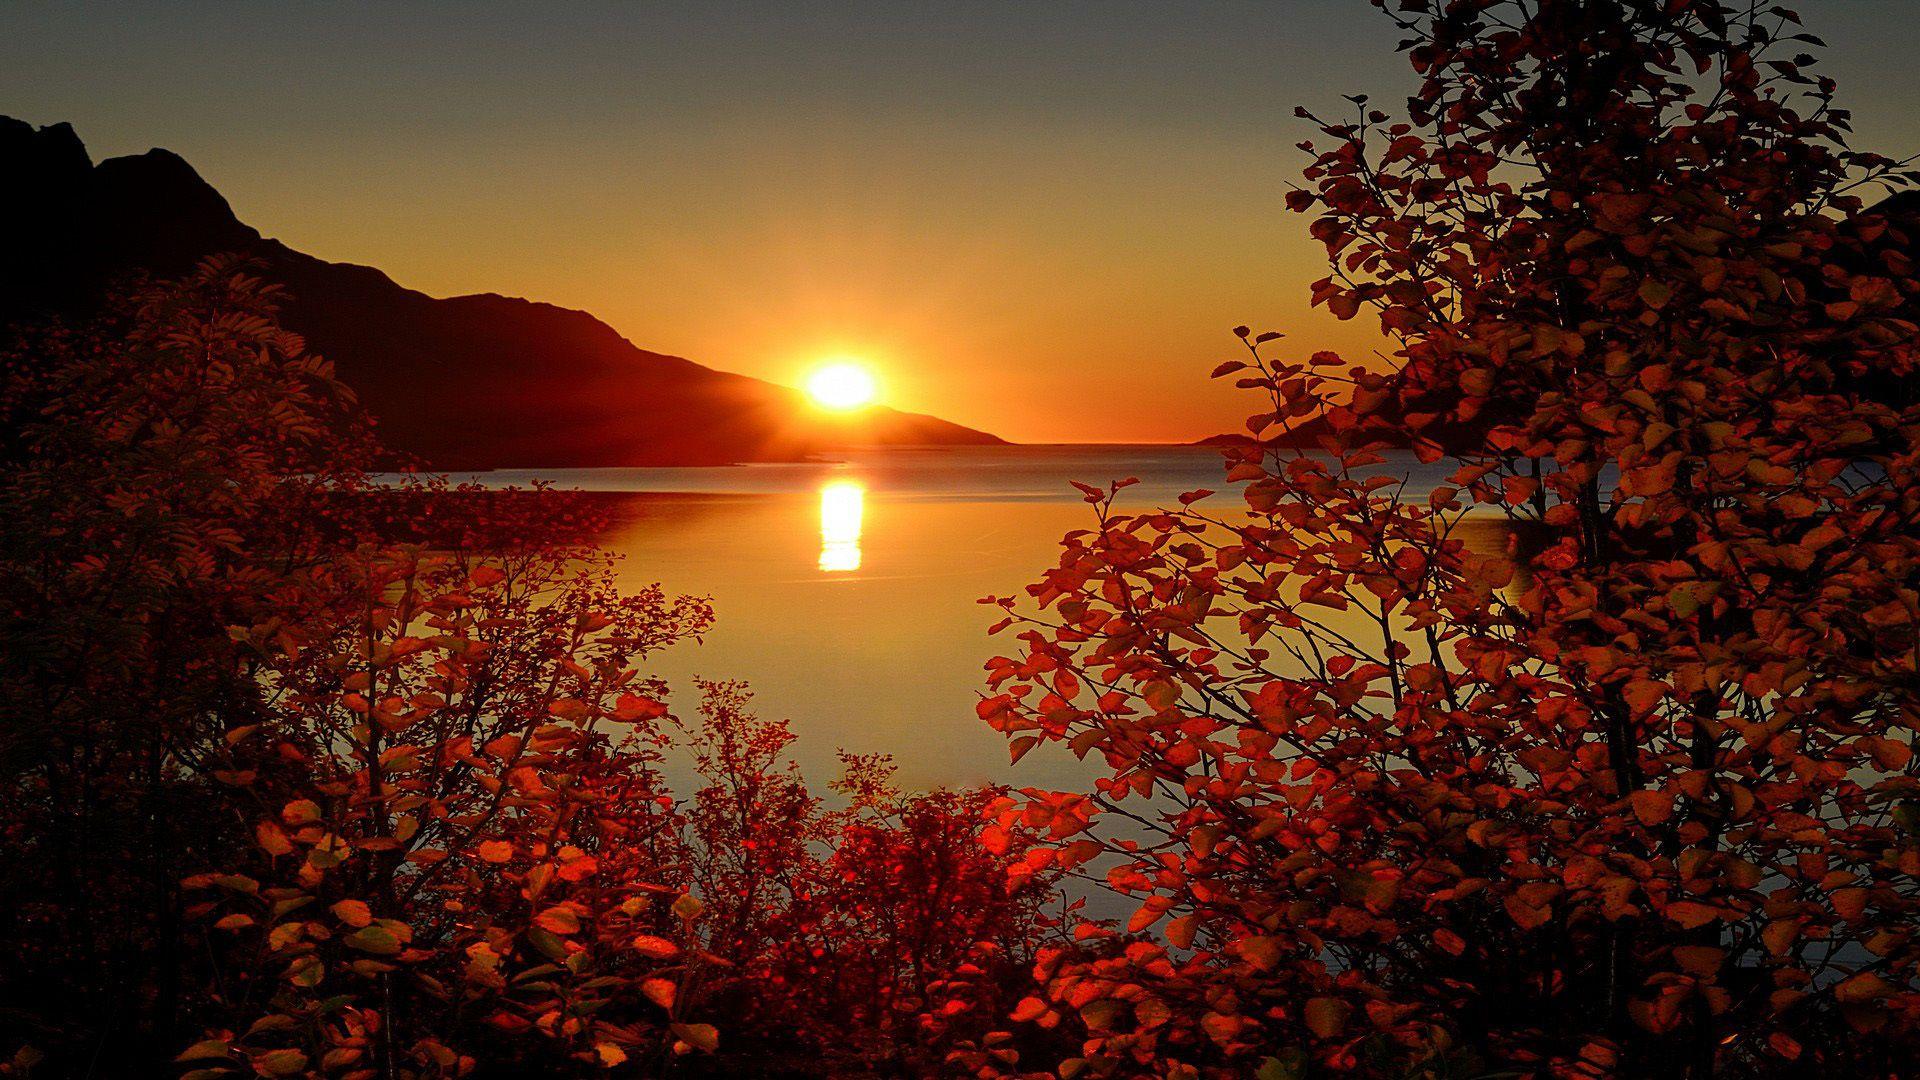 Facebook Cover Photo Sunset Beautiful Nature Nature Nature Photography